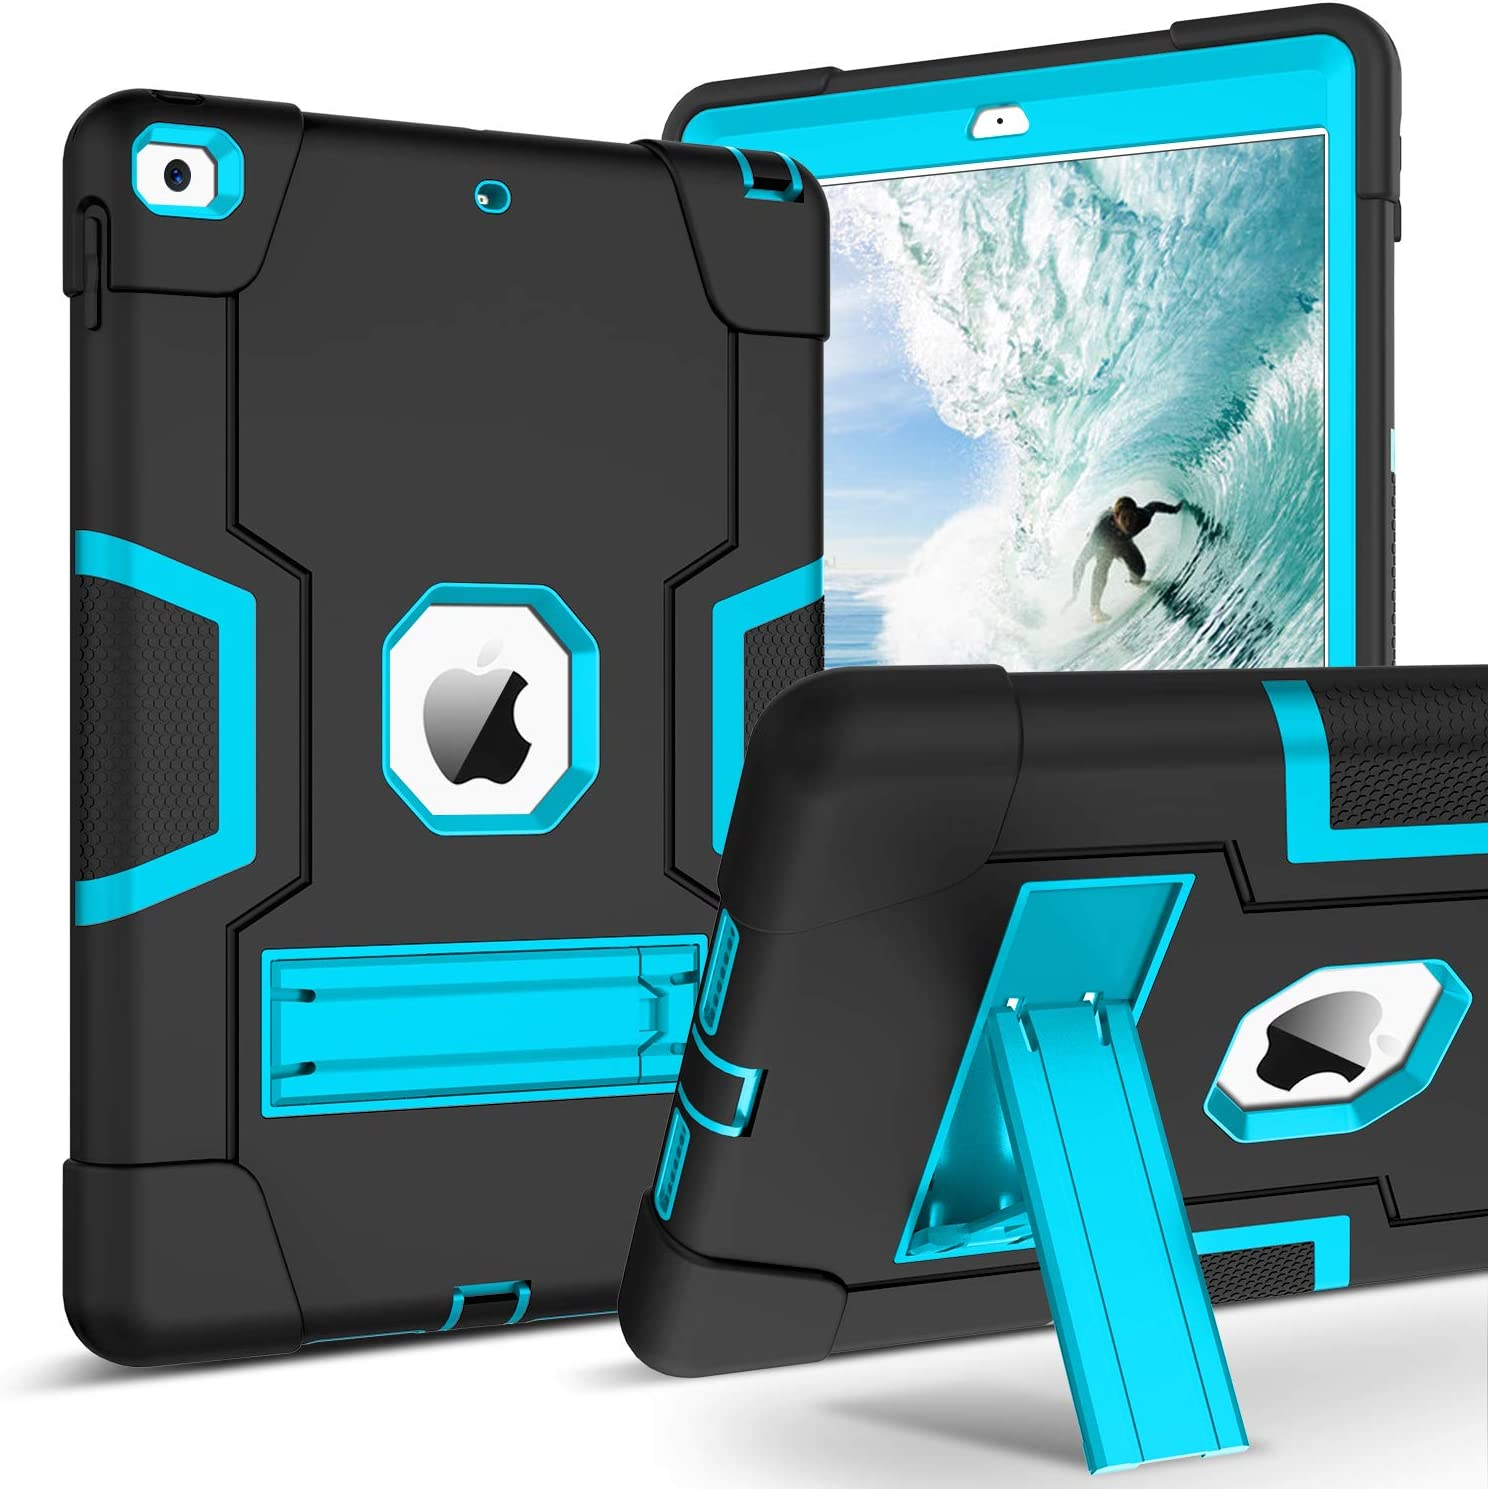 BENTOBEN iPad Be super welcome 8th Generation iPa Superlatite 7th Case